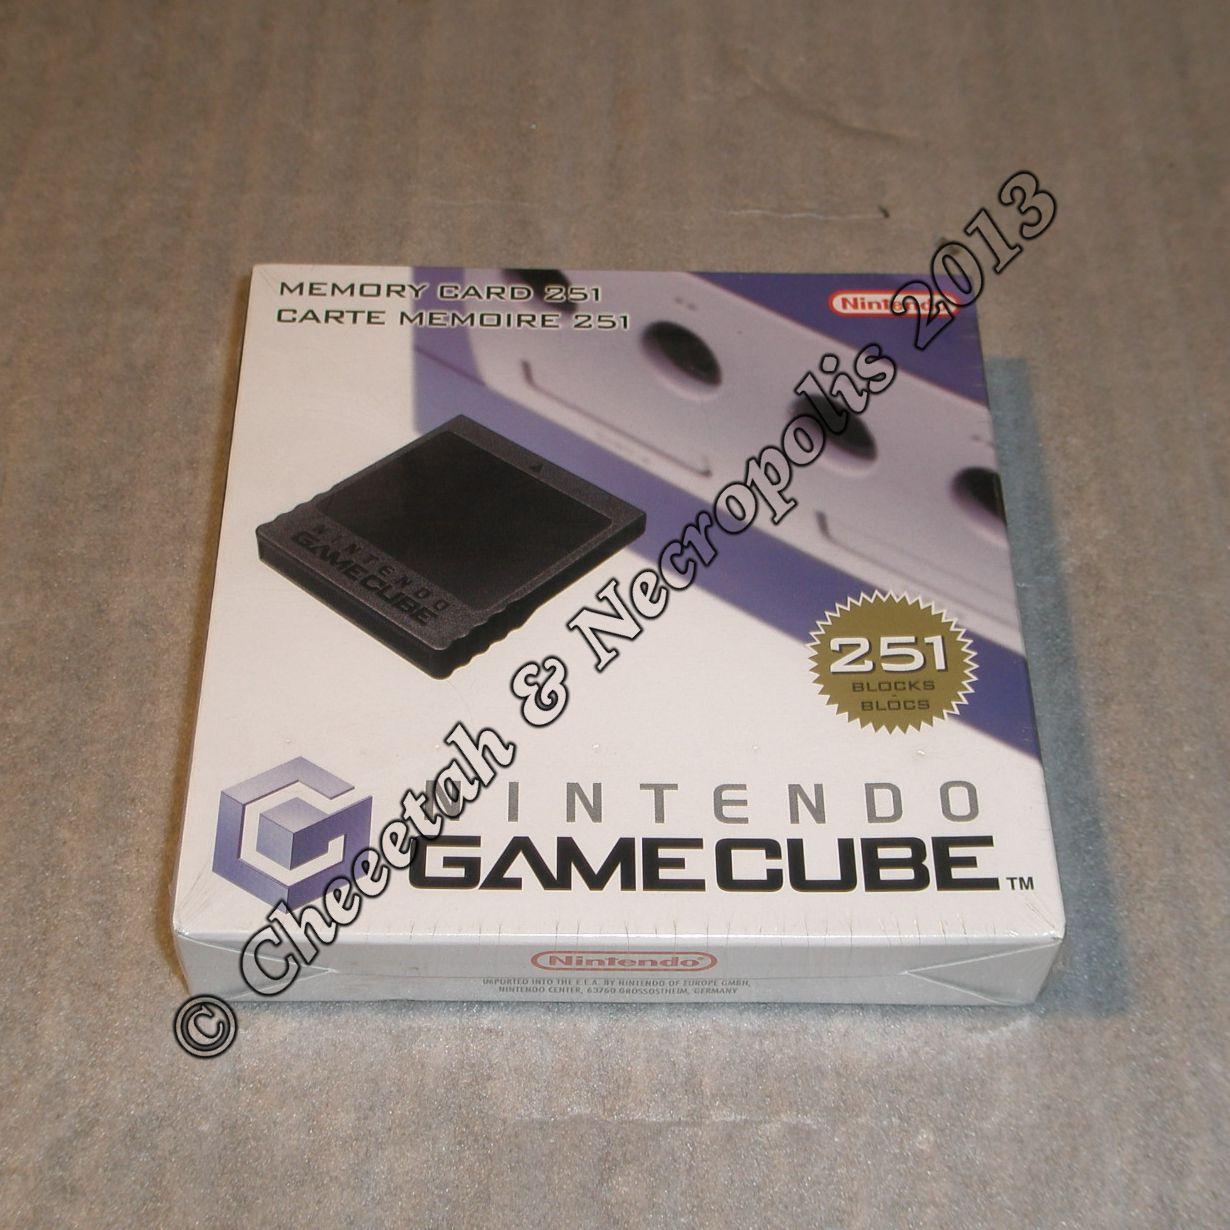 http://arcadius.esero.net/Console/Nintendo/Game_Cube/Memory_Card_251_Blocks_01.jpg